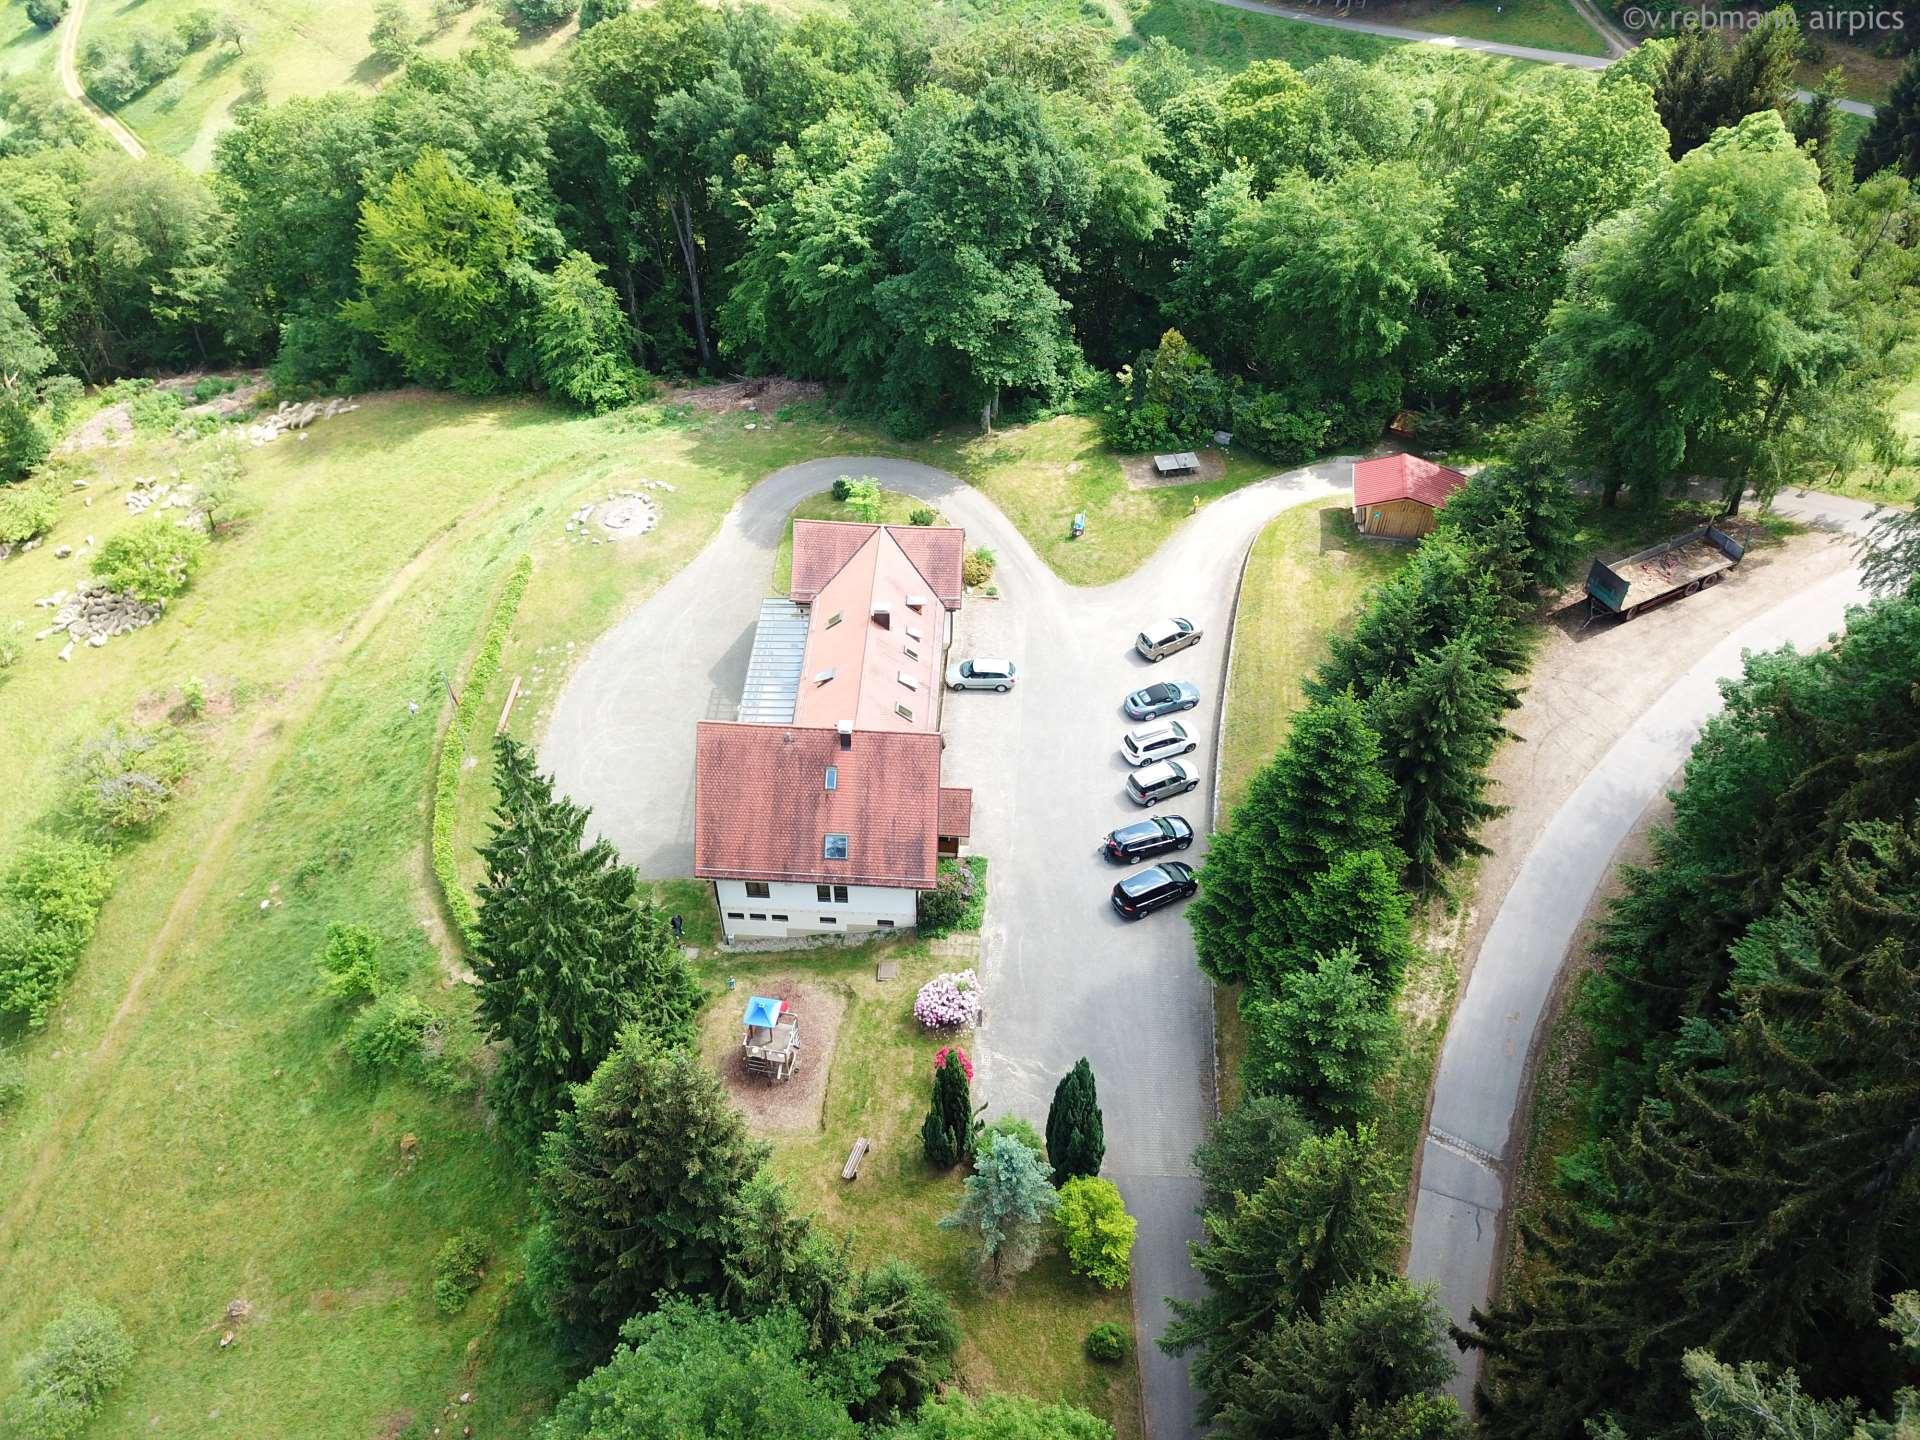 Einfahrt zum Kolpinghaus (Luftbild)